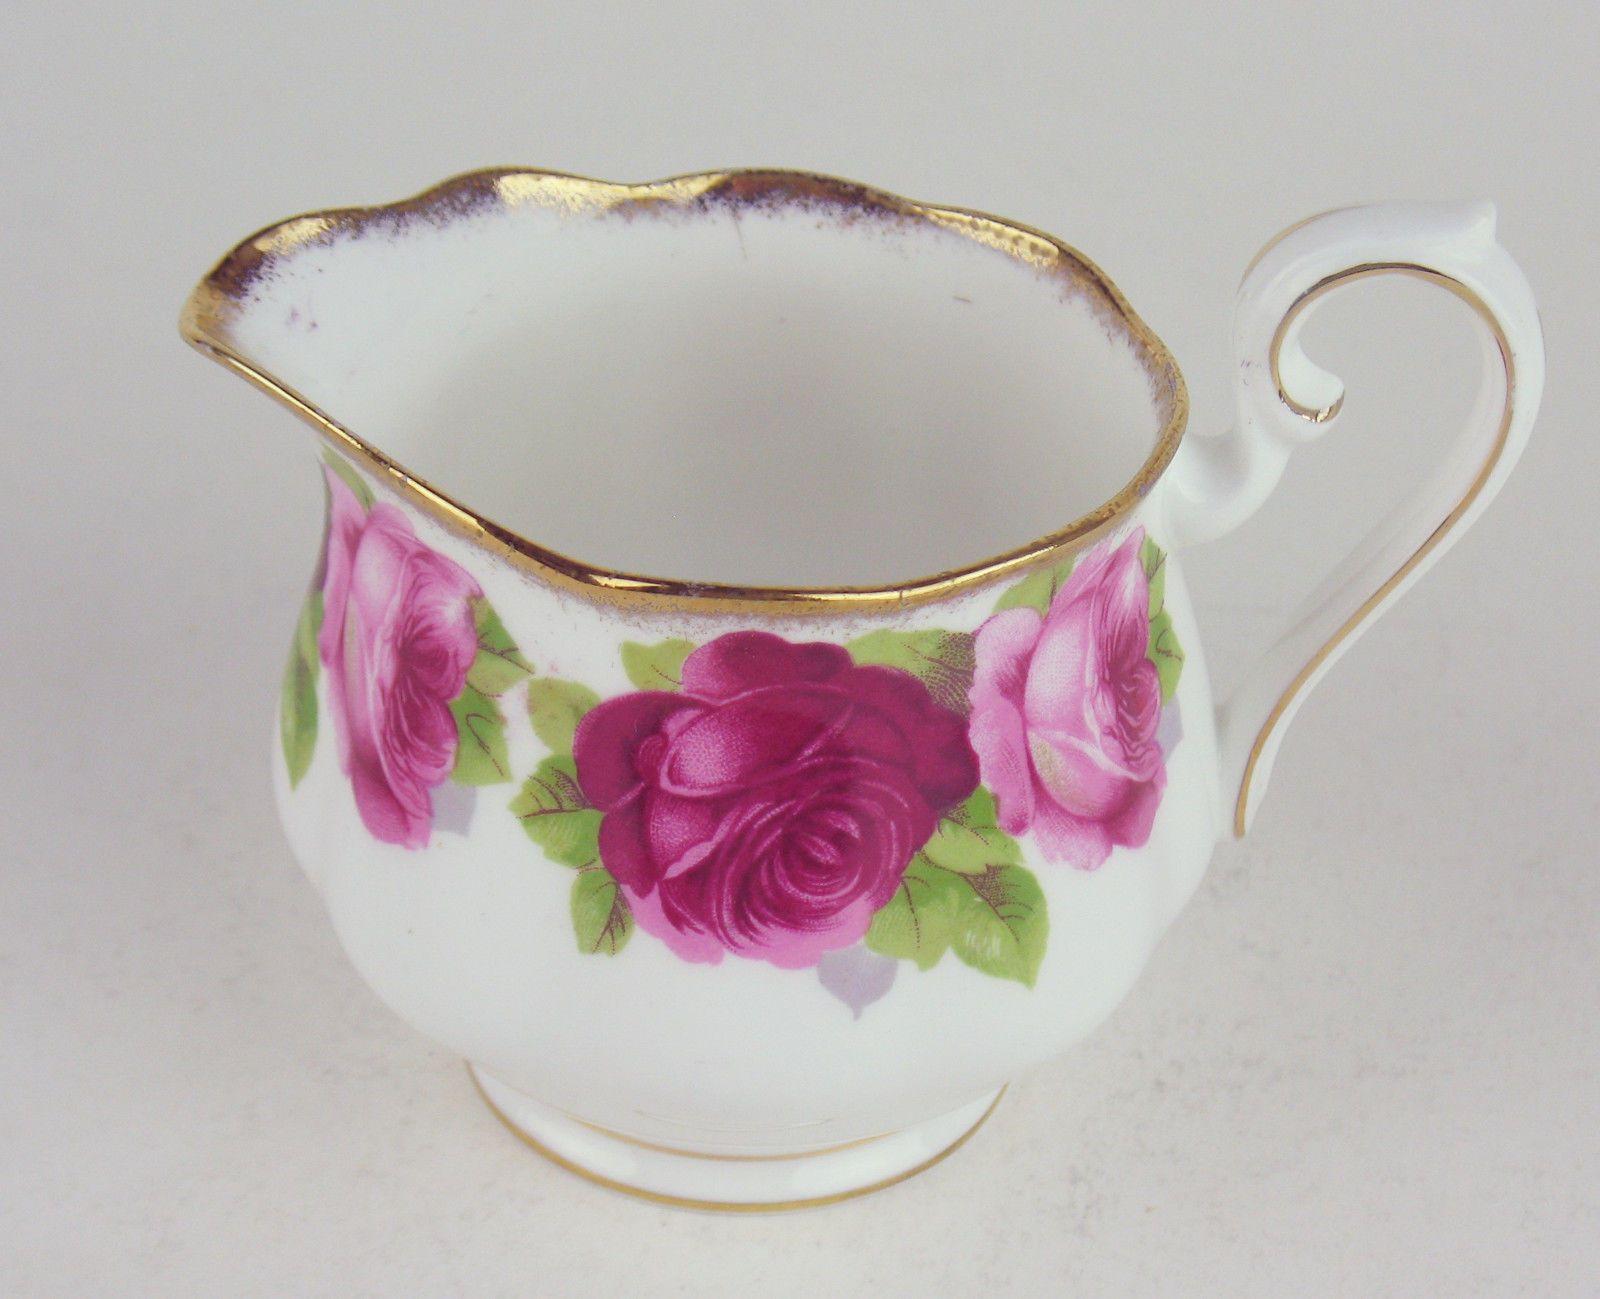 Royal albert bone china tea cup amp saucer winsome pattern ebay - Covered Sugar Bowl Creamer Royal Albert Old English Rose Bone China England